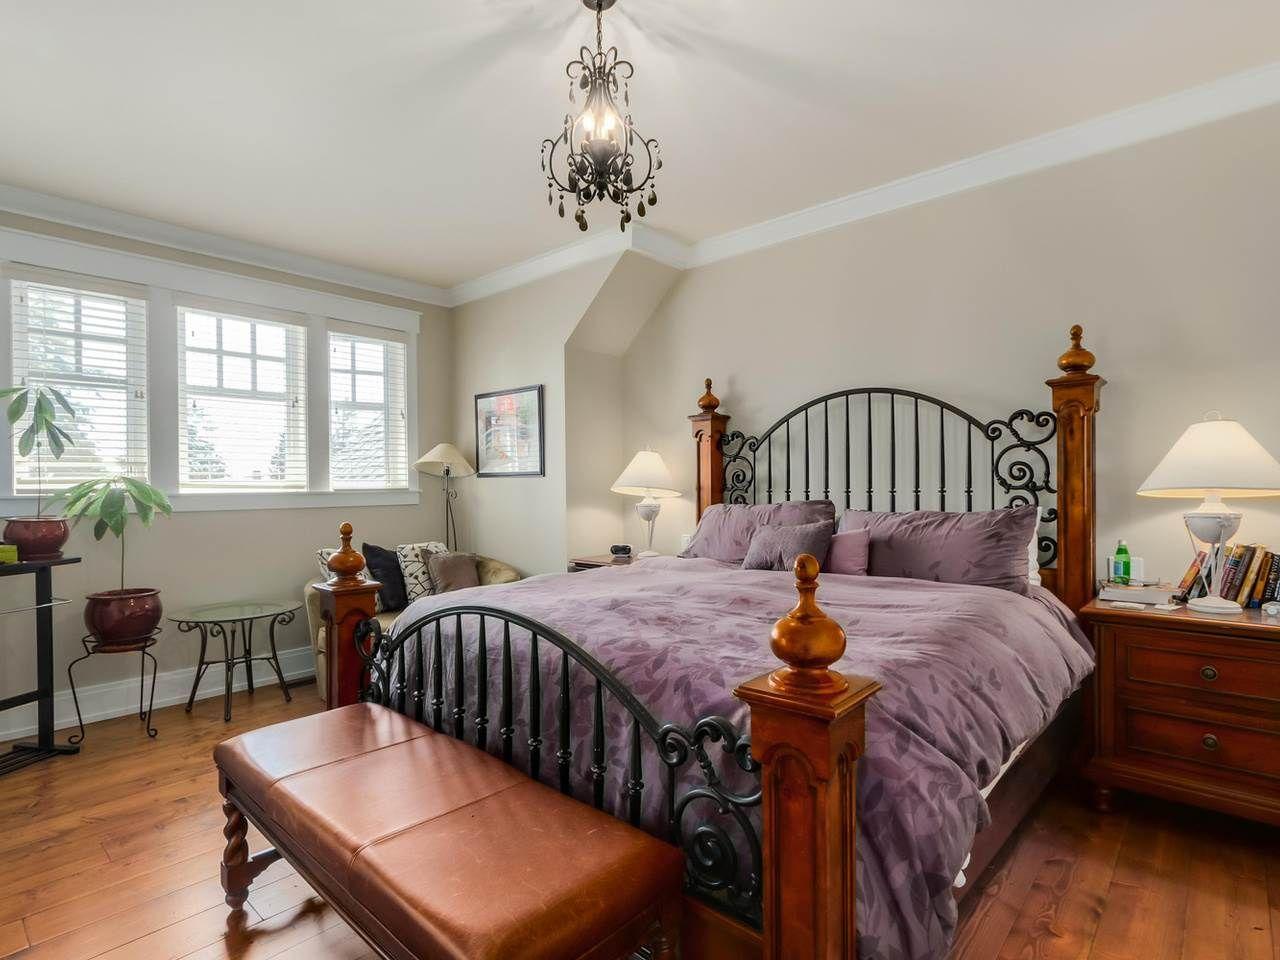 Photo 11: Photos: 13029 14 Avenue in Surrey: Crescent Bch Ocean Pk. House for sale (South Surrey White Rock)  : MLS®# R2070160